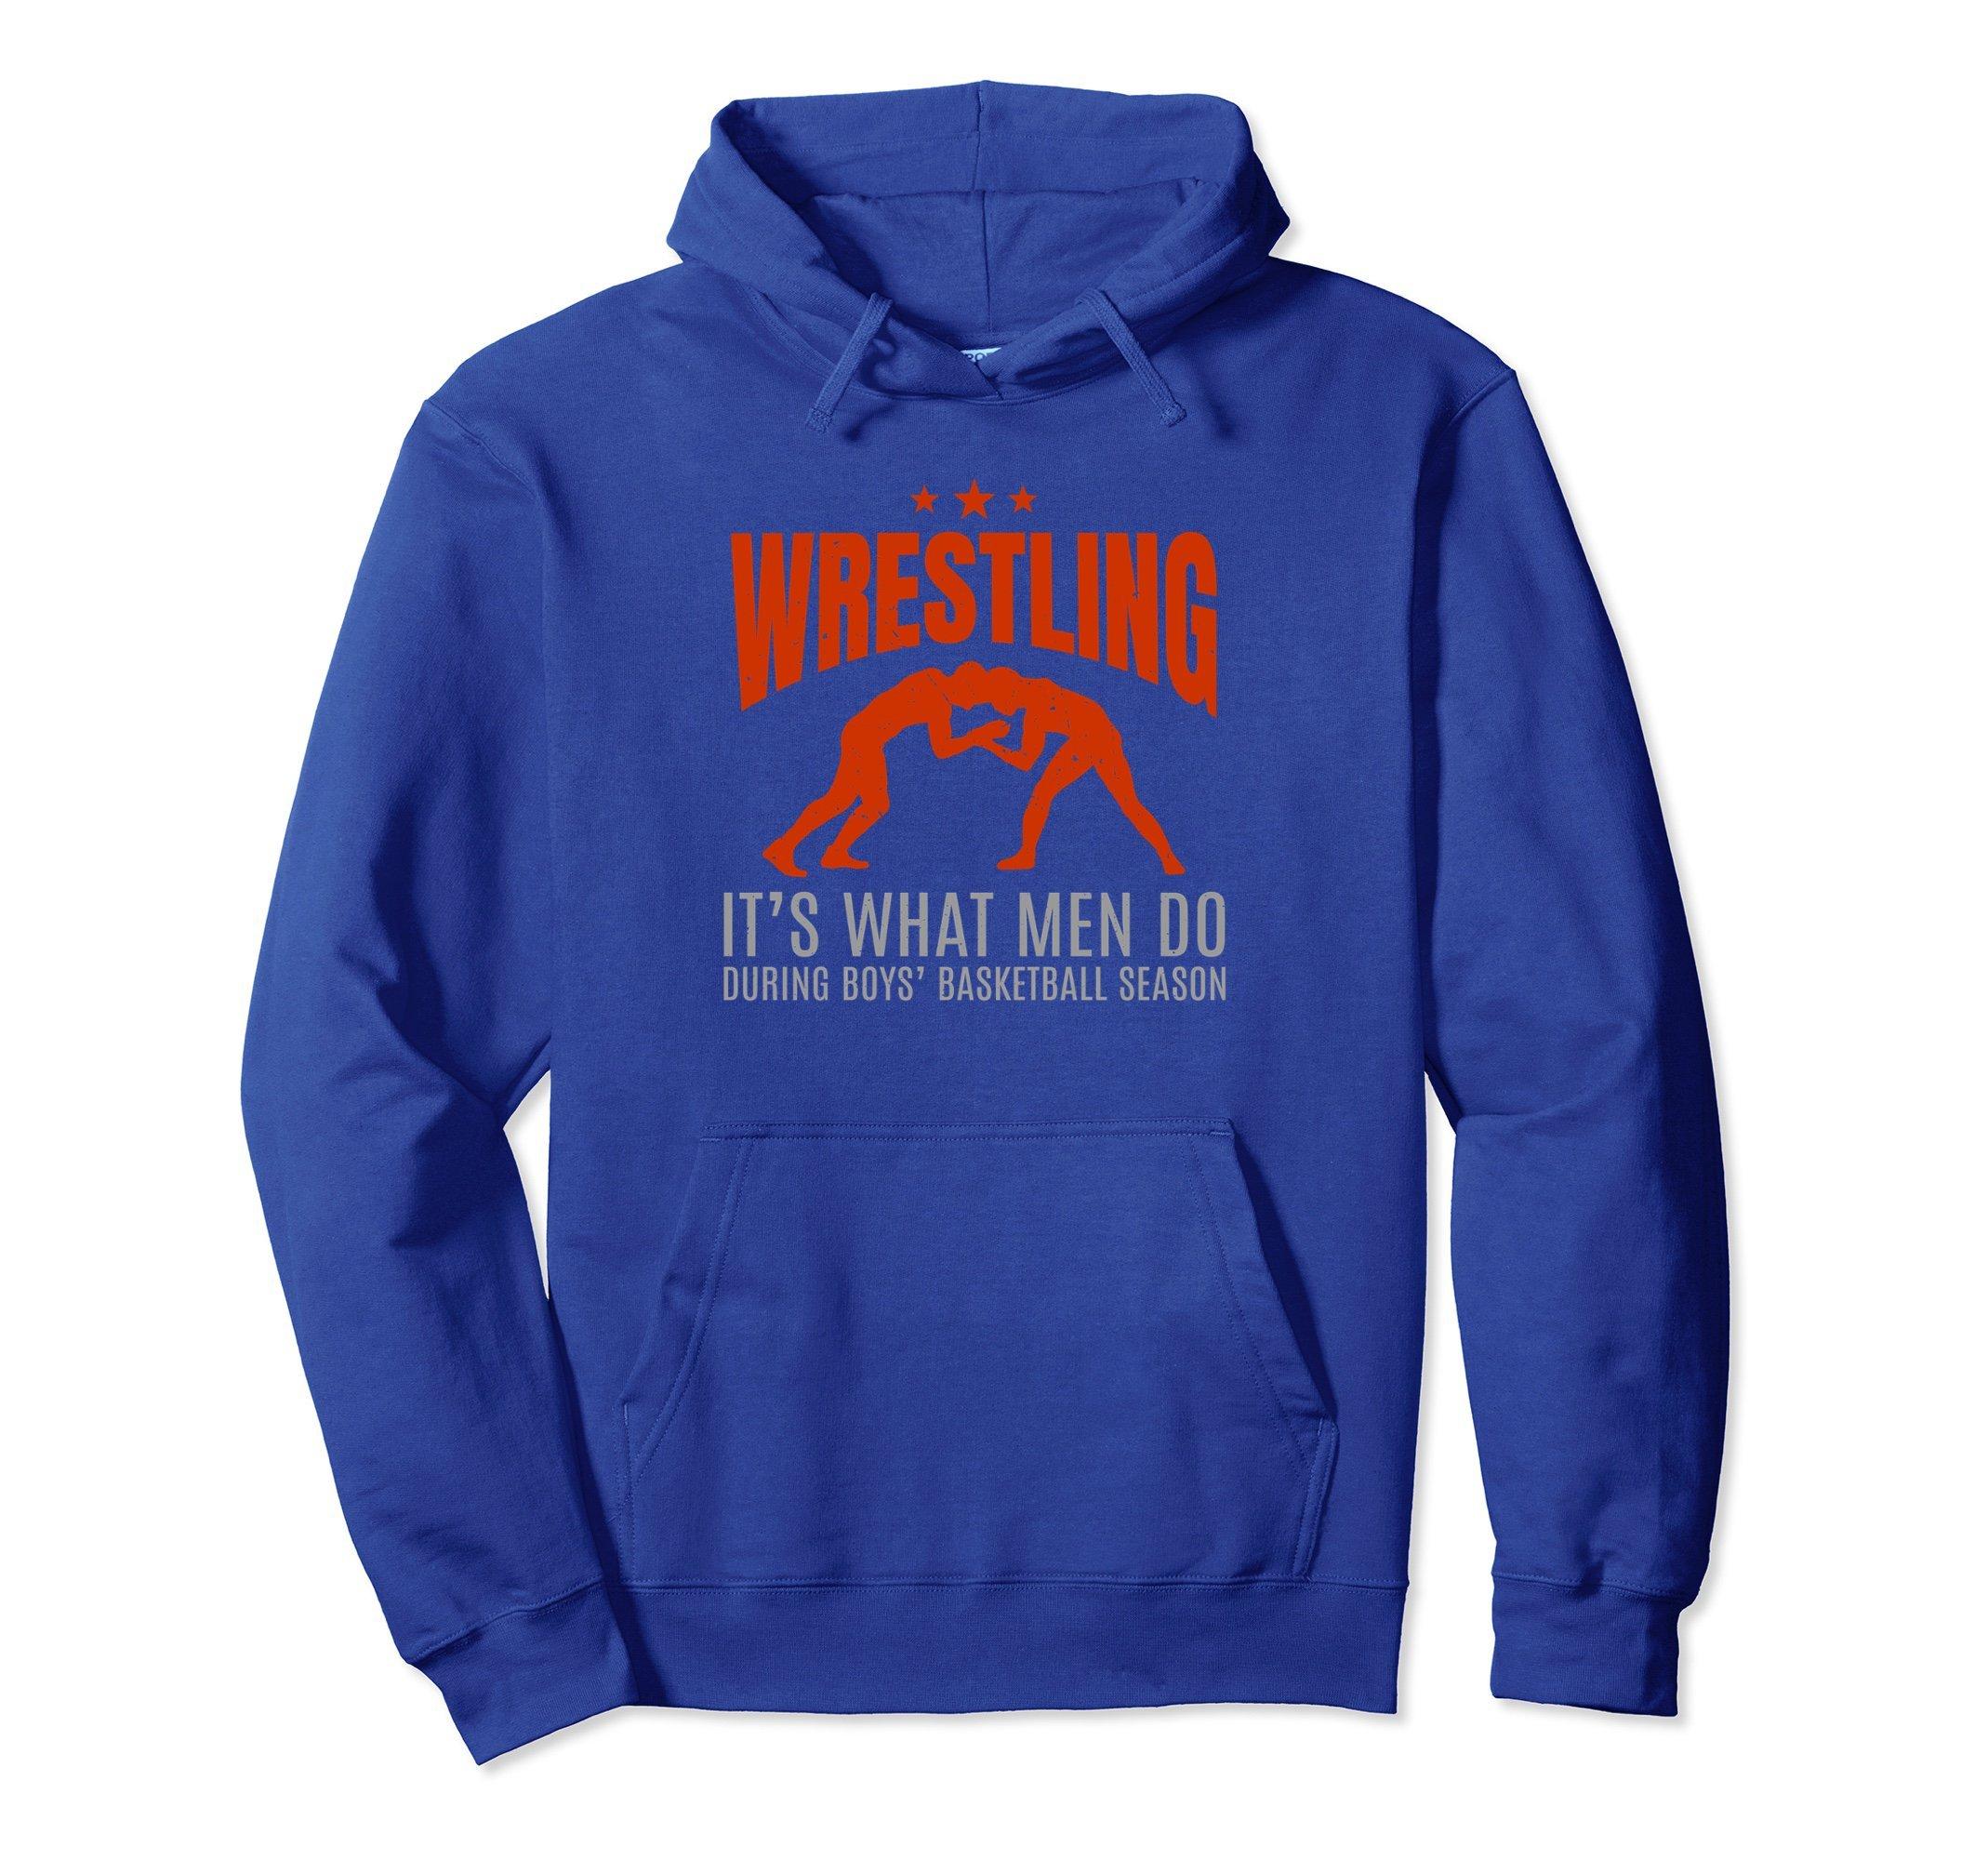 Unisex Funny Graphic Wrestling Hoodie Wrestle Gift for Wrestler XL: Royal Blue